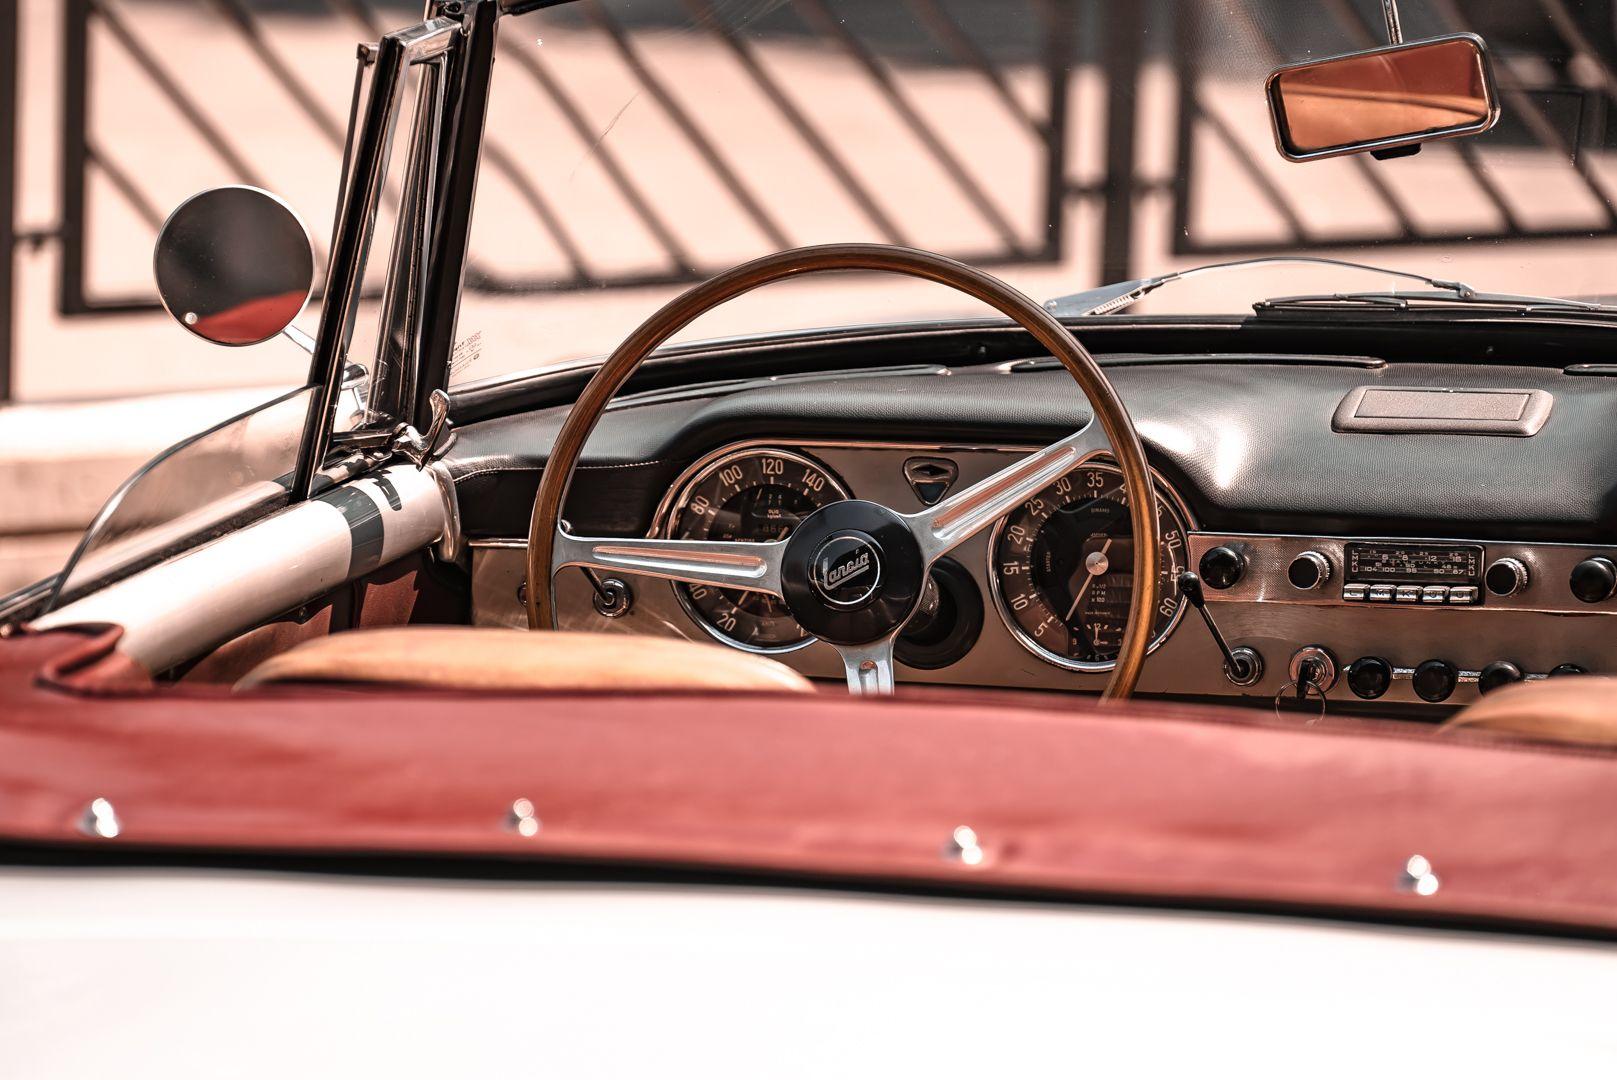 1963 Lancia Flaminia Touring Convertible 2500 3C  73161